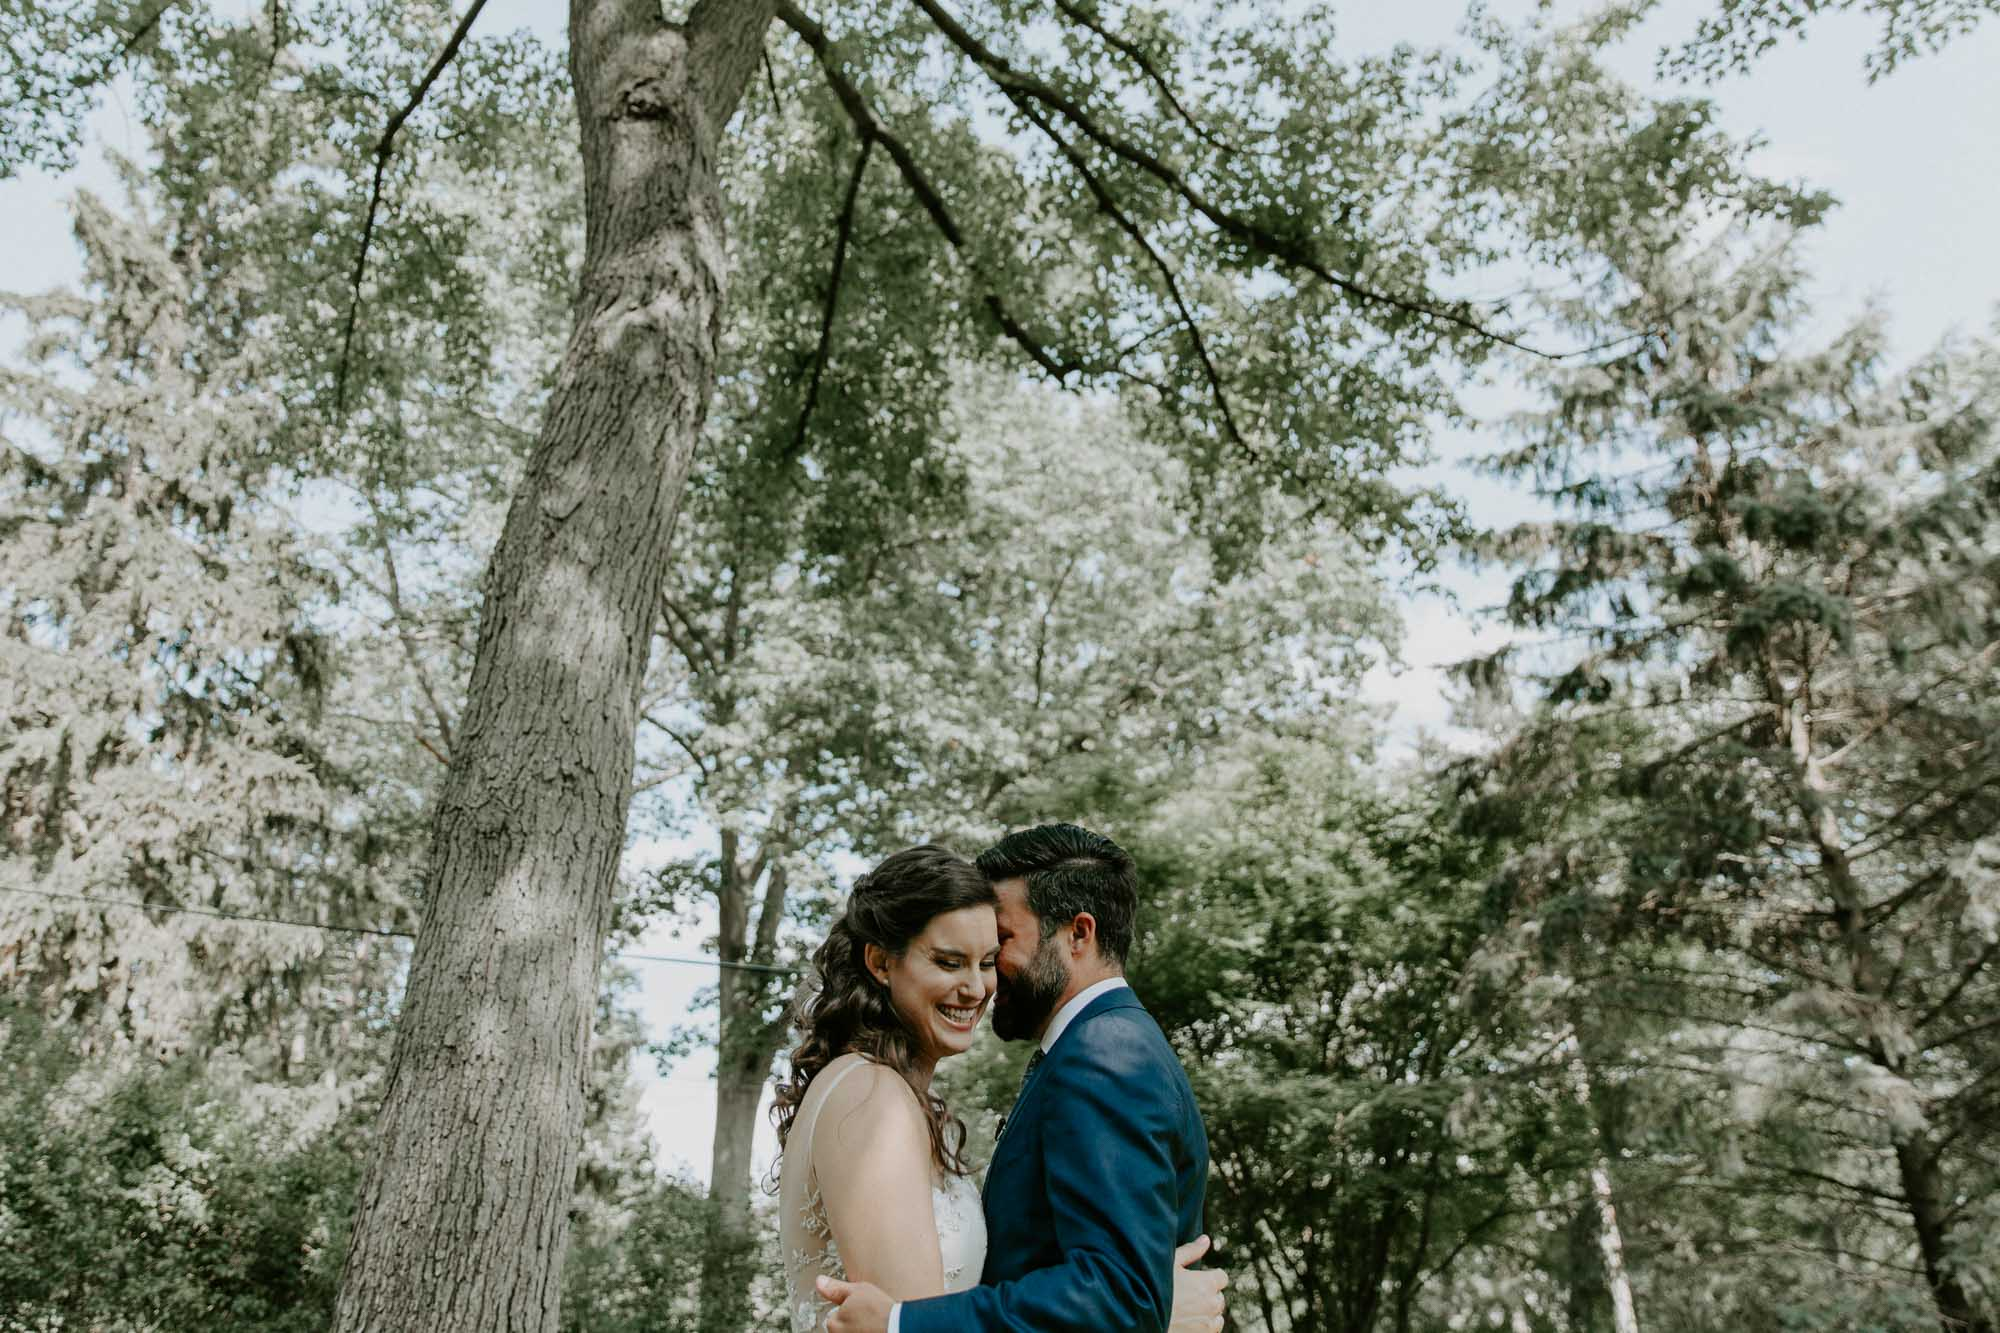 journeyman_distillery_wedding_photographer_chicago_il_wright_photographs-5864.jpg